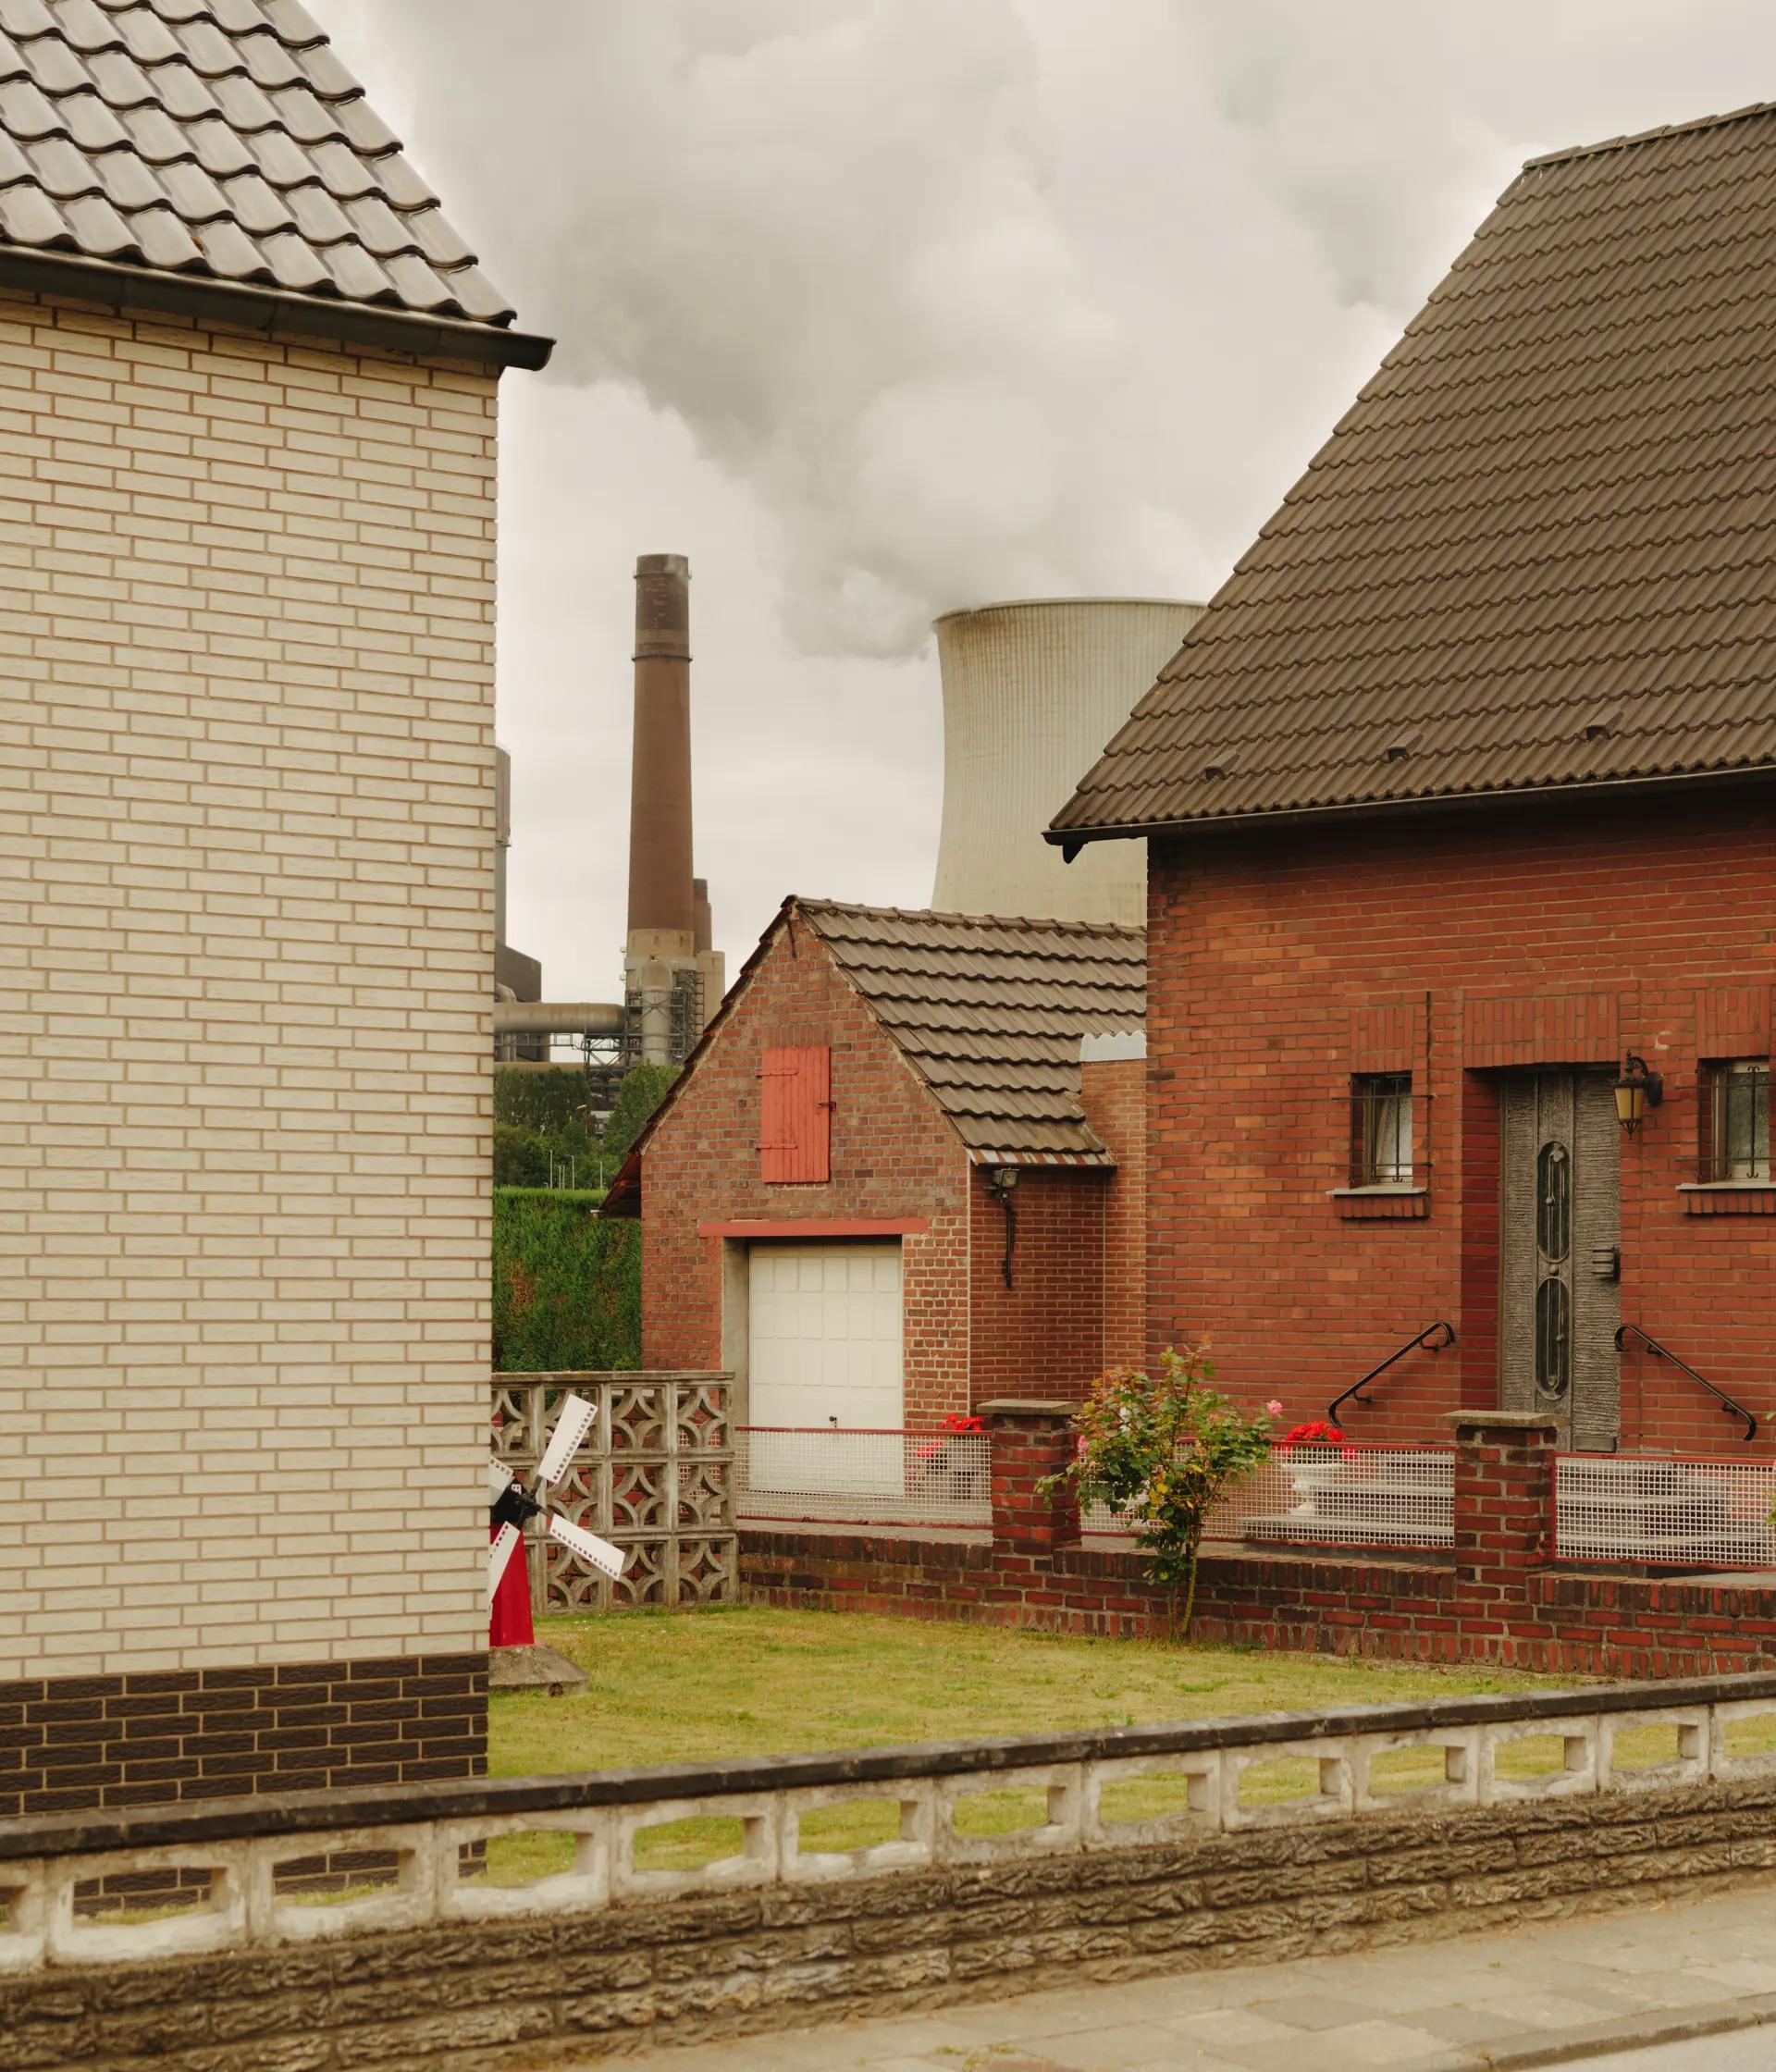 Neurath, Germany (Dan Wilton)